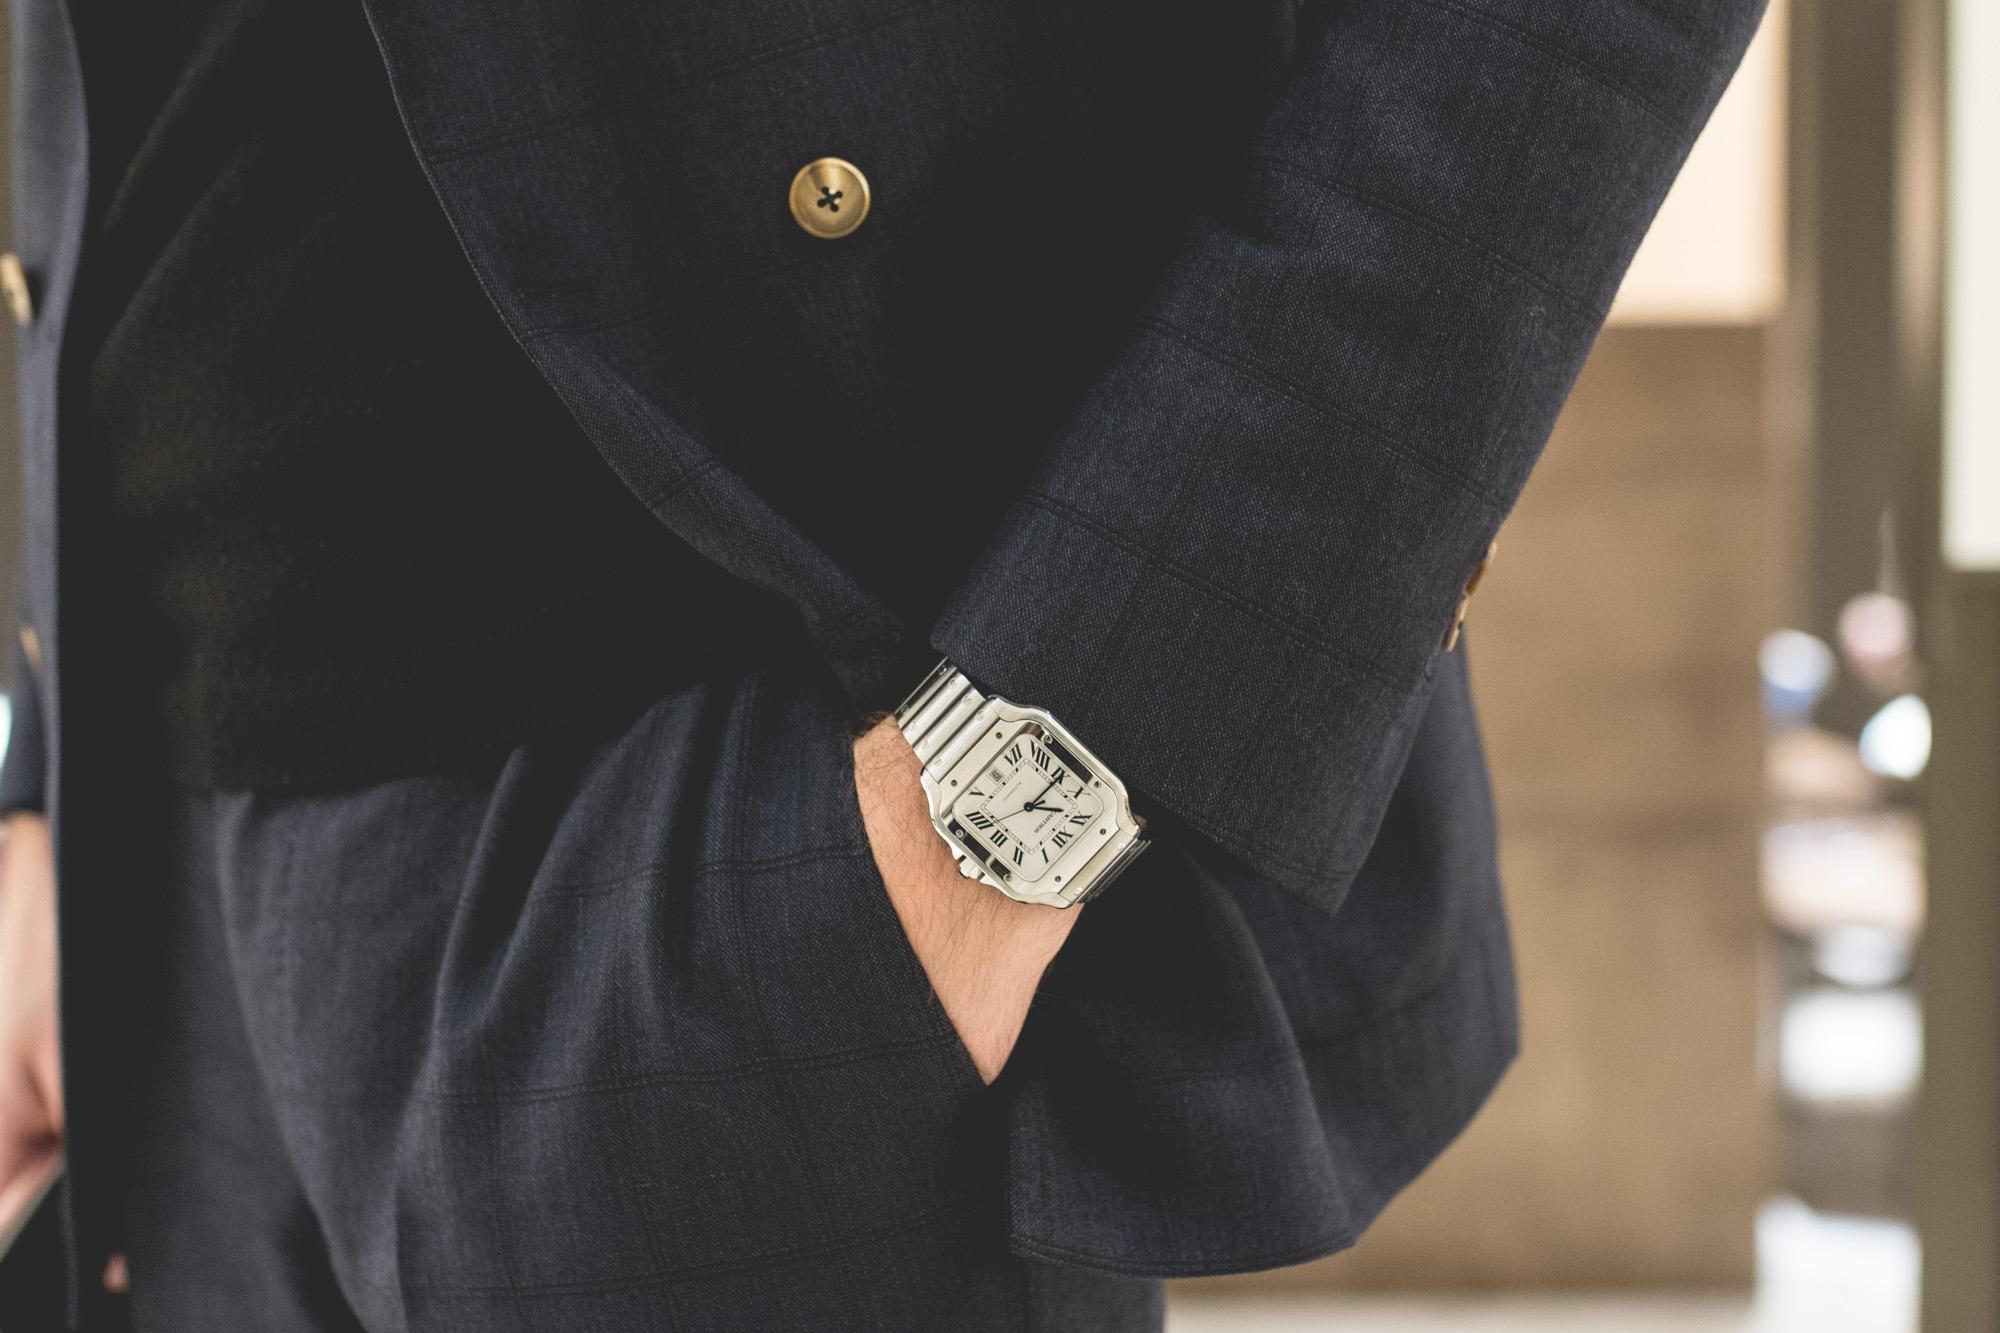 Cartier SIHH 2018 - Santos acier - Wrist